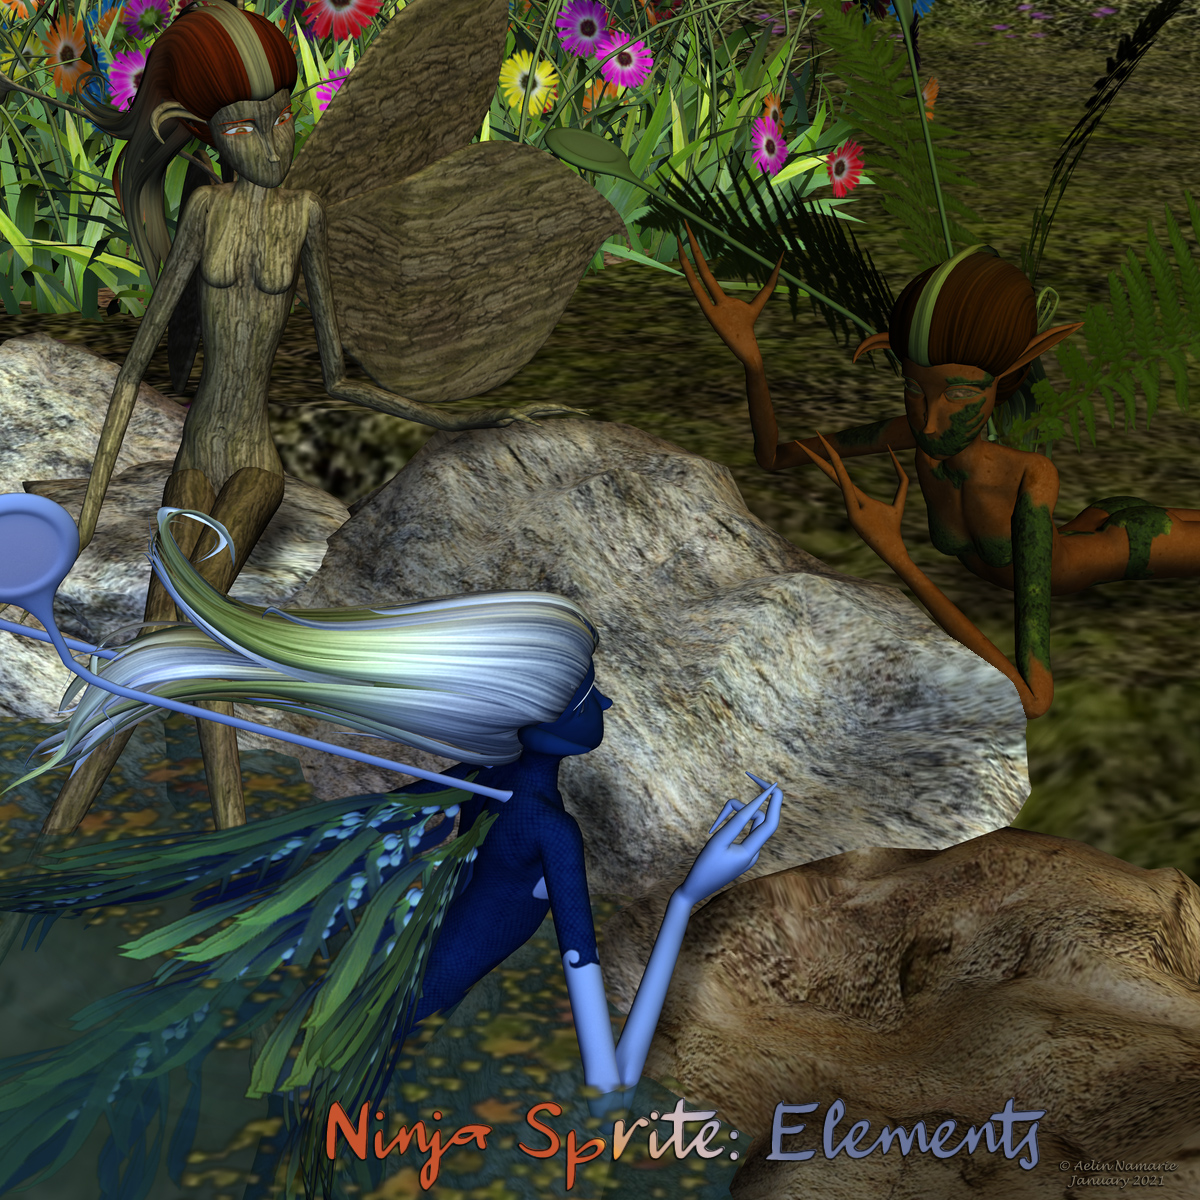 Ninja Sprite: Elements